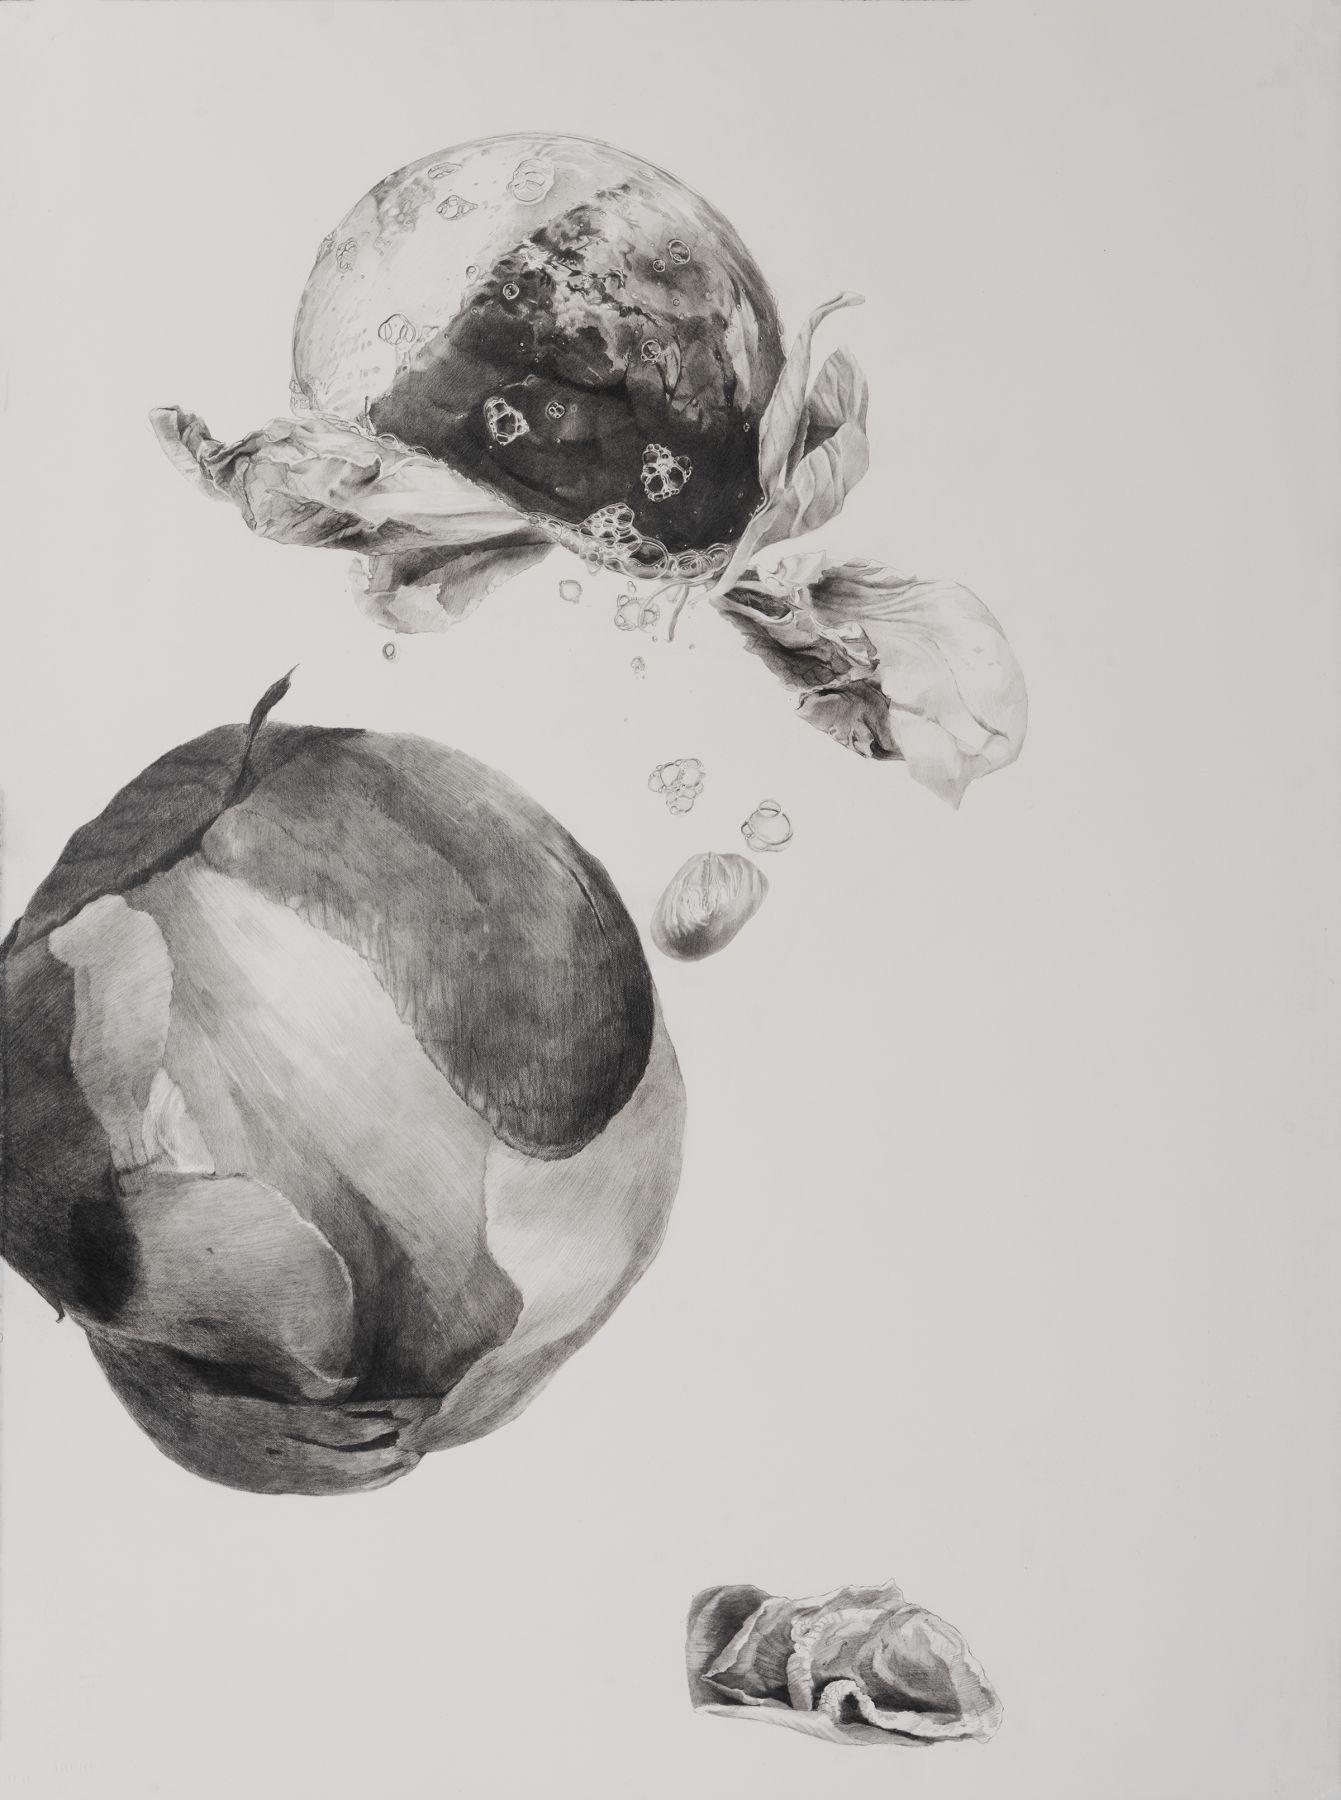 Dead Flowers 3, graphite on paper, 30 x 22 1/2 in, JR039